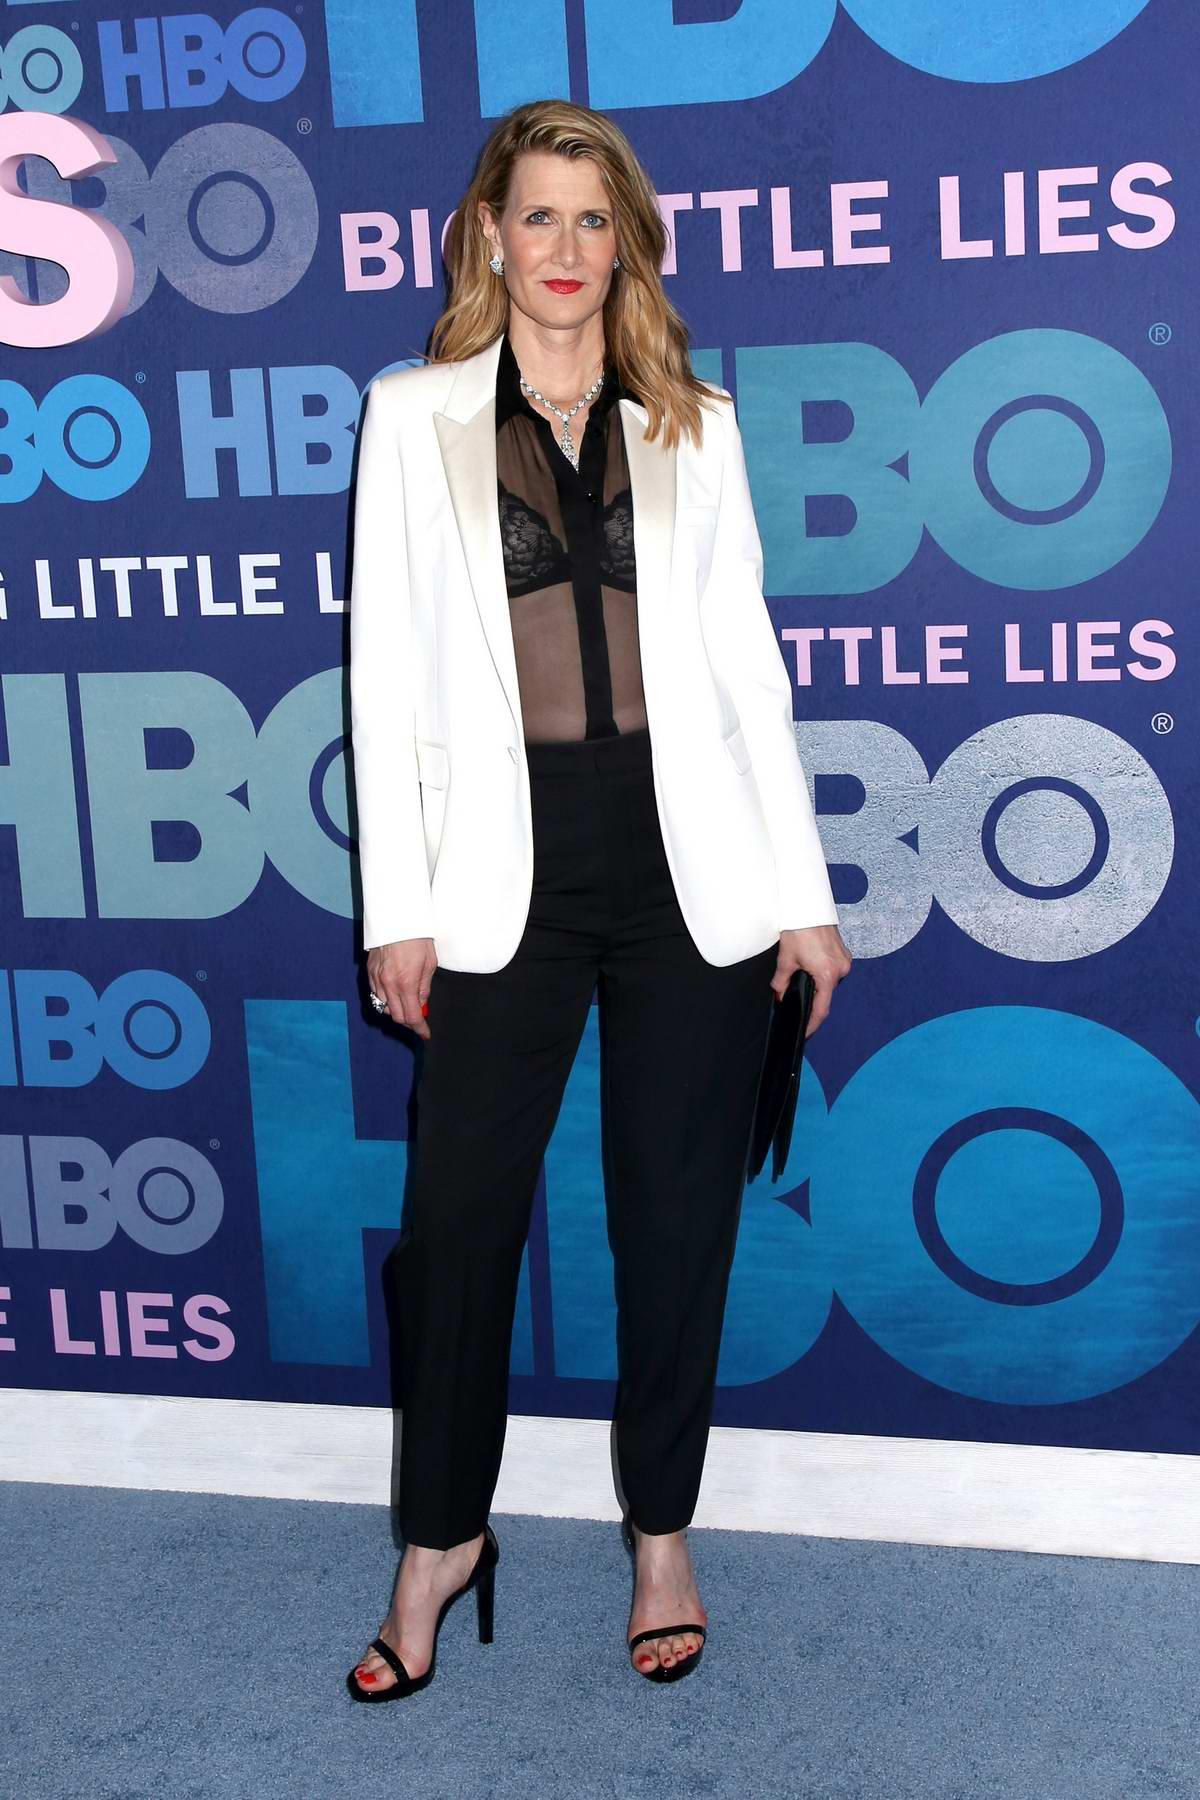 Laura Dern attends the Premiere of 'Big Little Lies' Season 2 in New York City